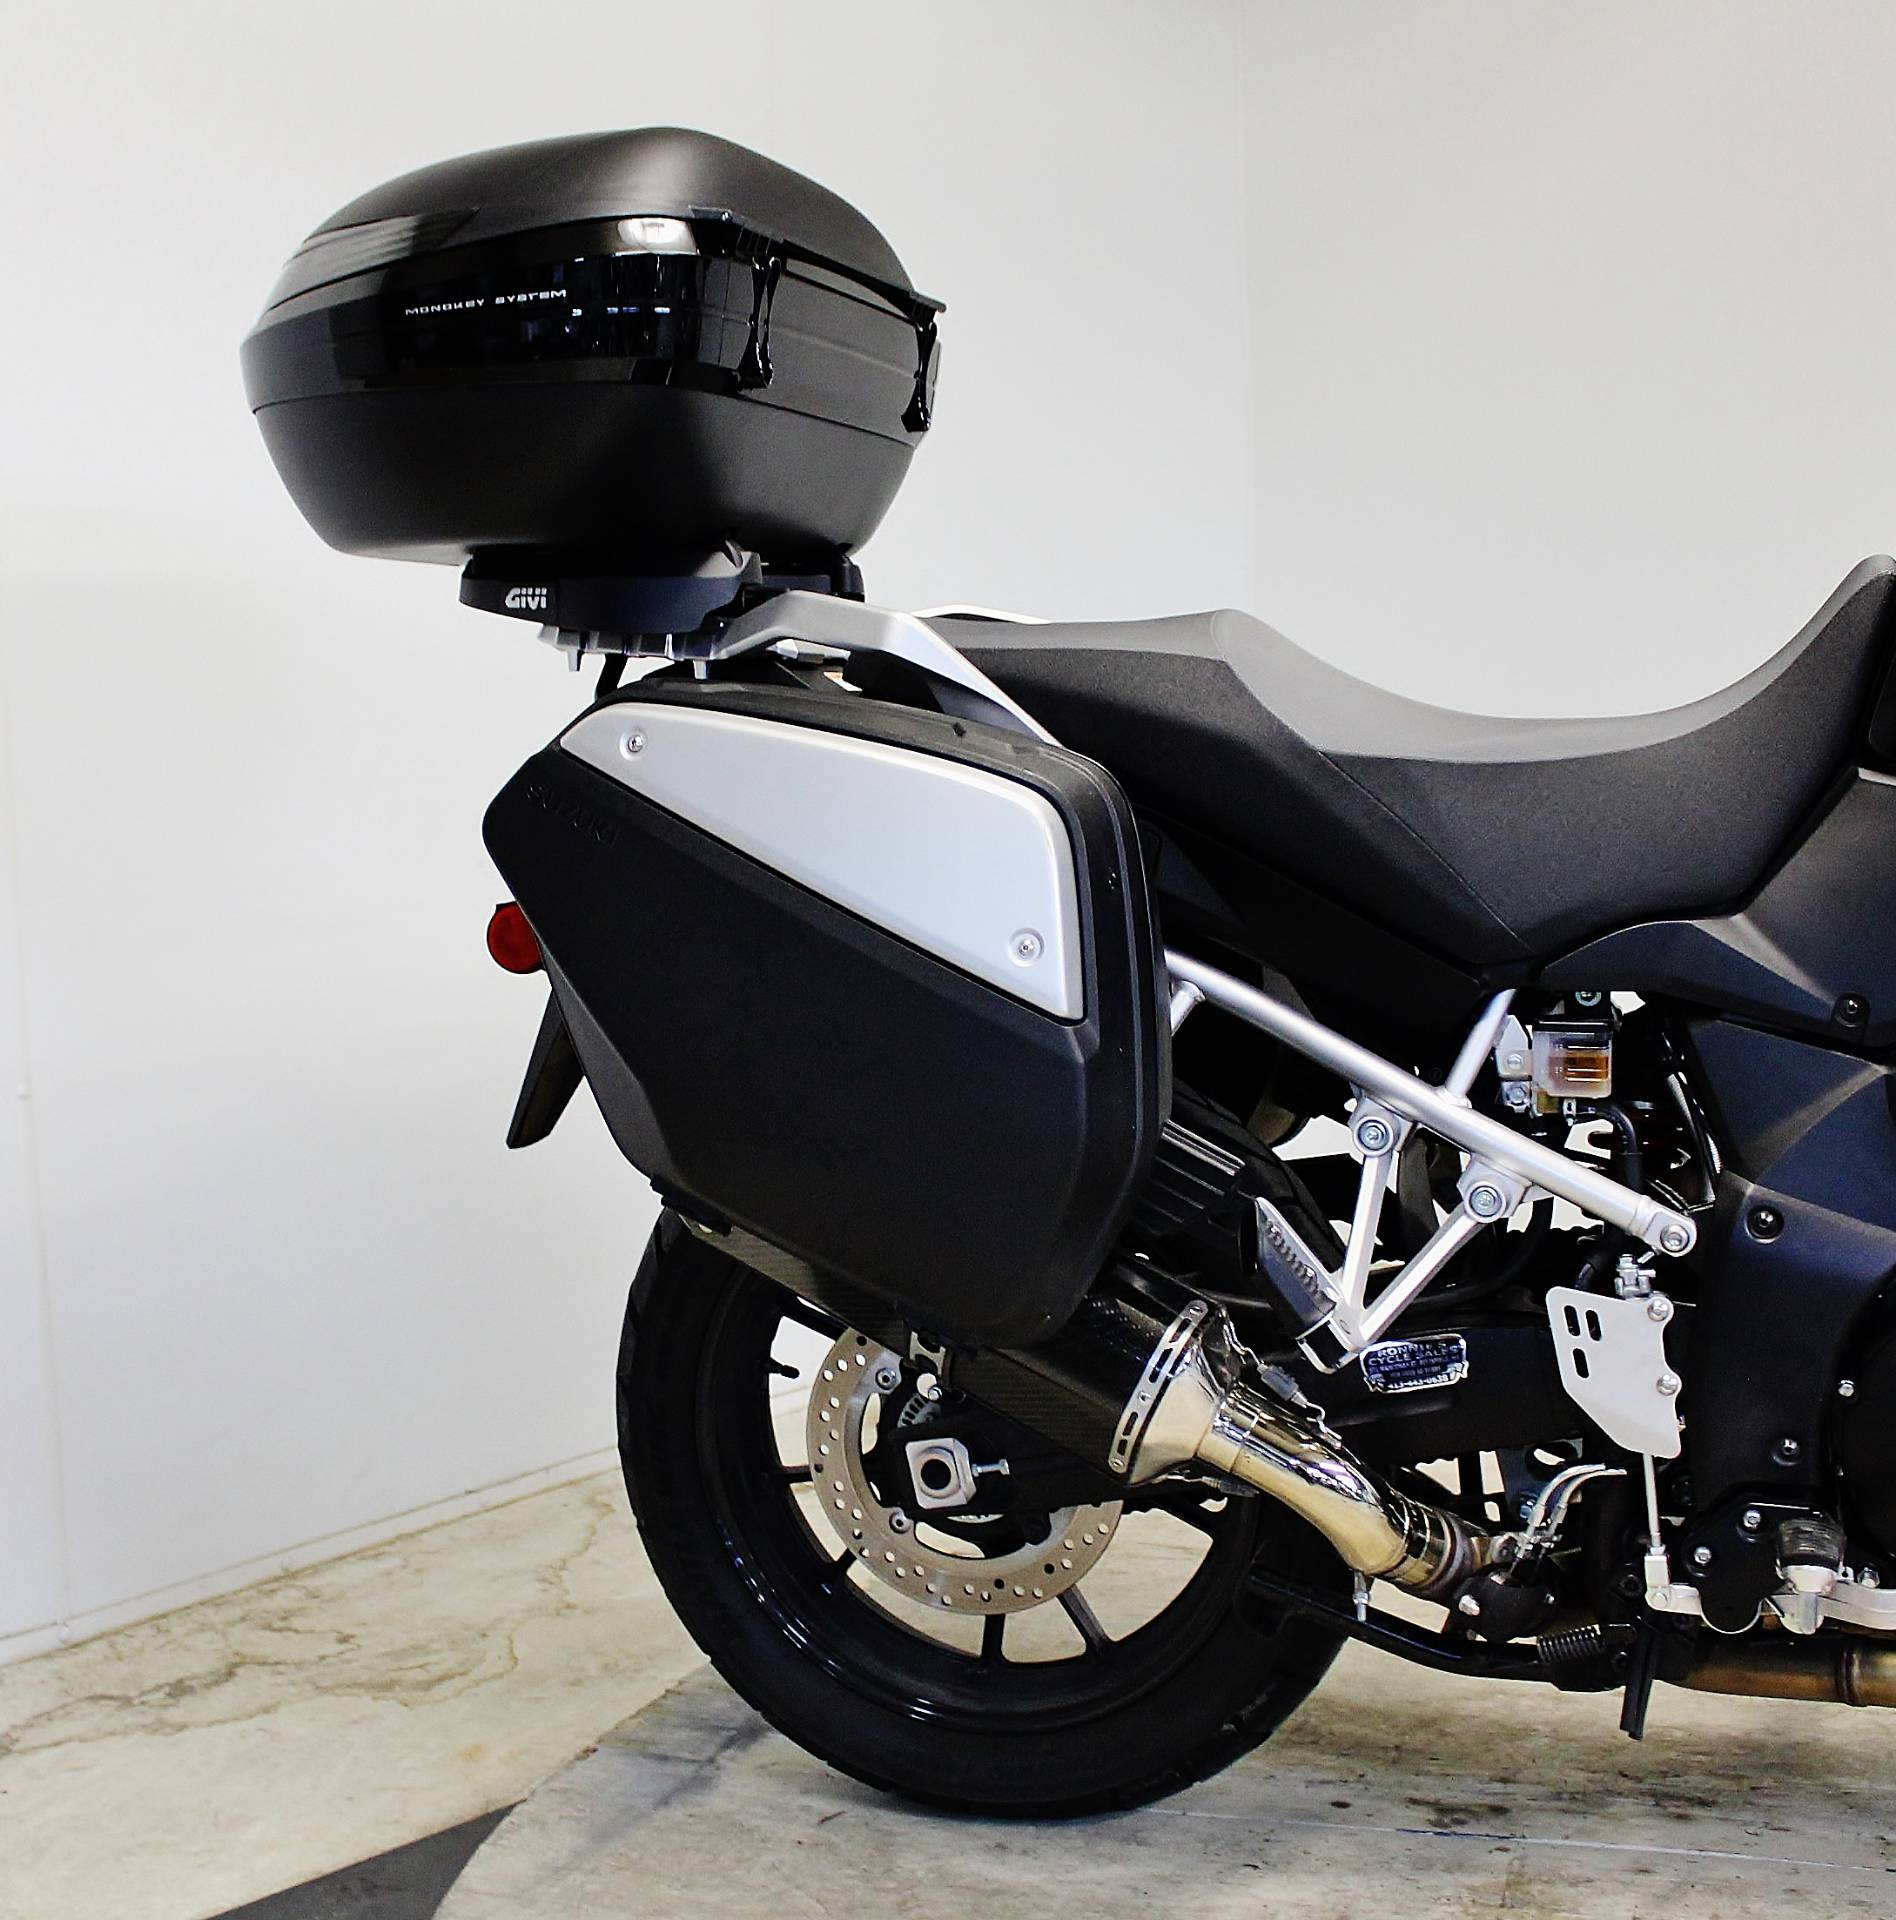 2014 Suzuki V-Strom 1000 ABS Adventure in Pittsfield, Massachusetts